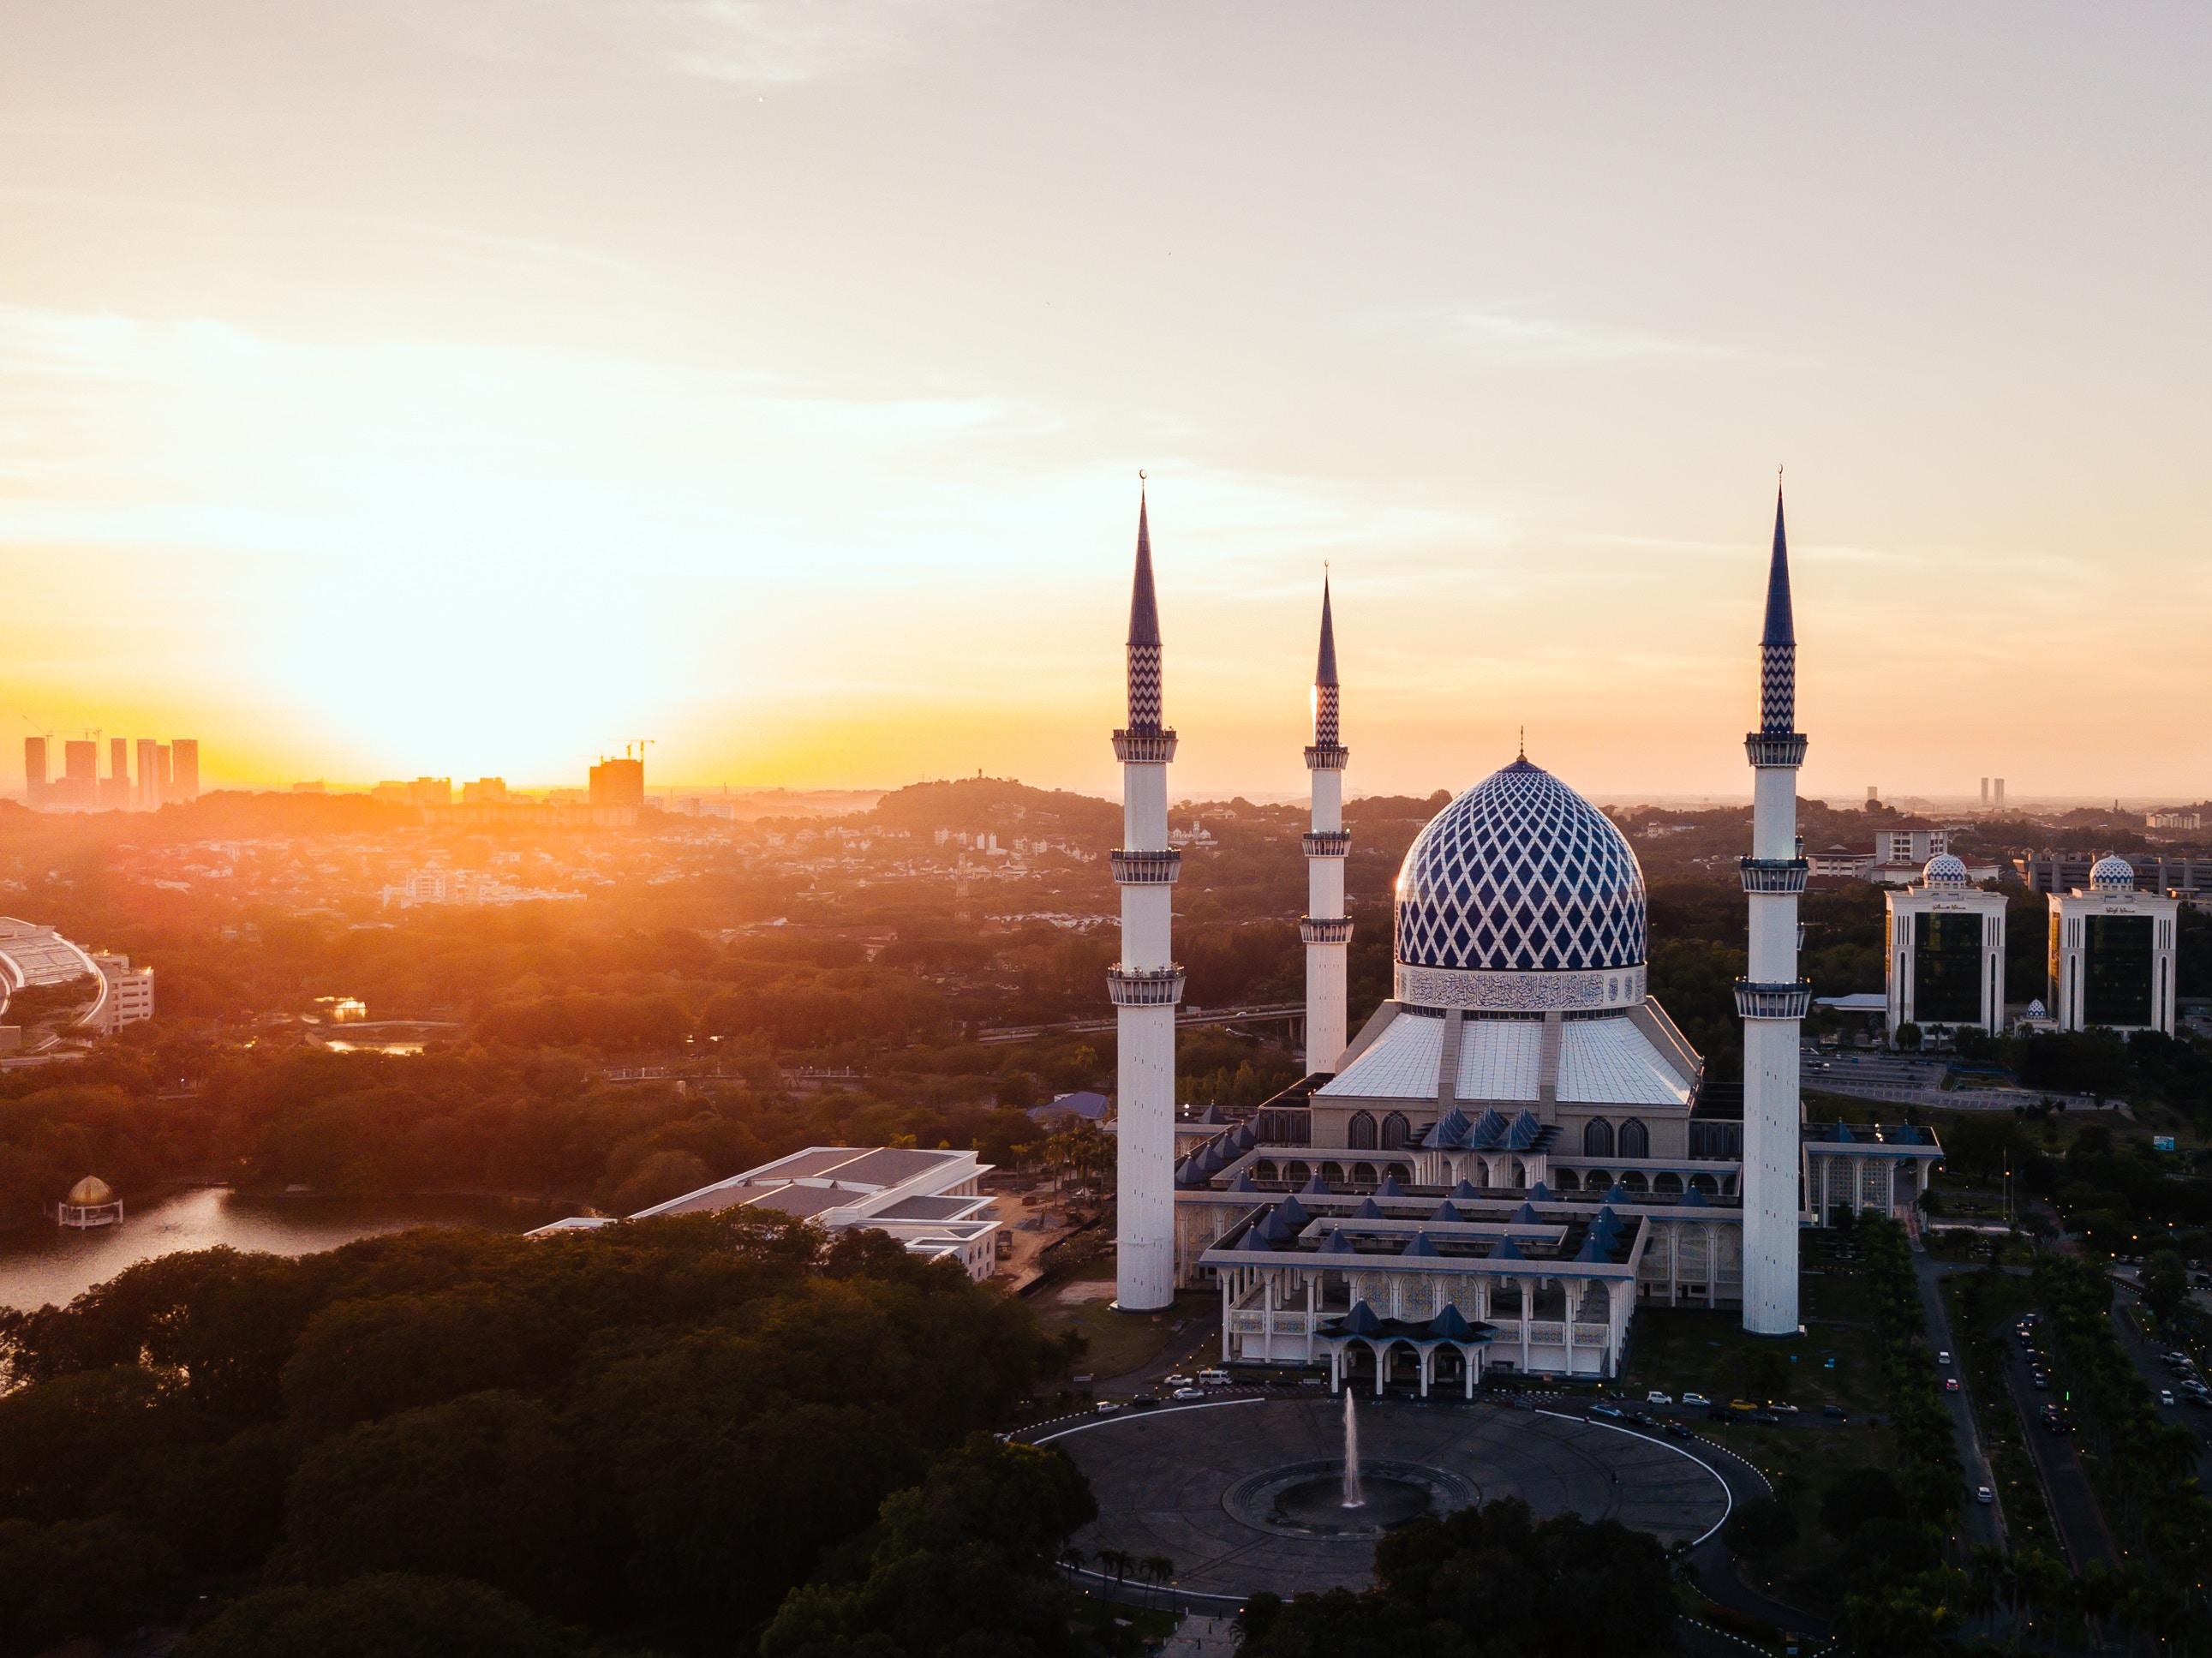 Sale Blu Di Persia Wikipedia : Malaysias struggle to preserve religious pluralism quillette